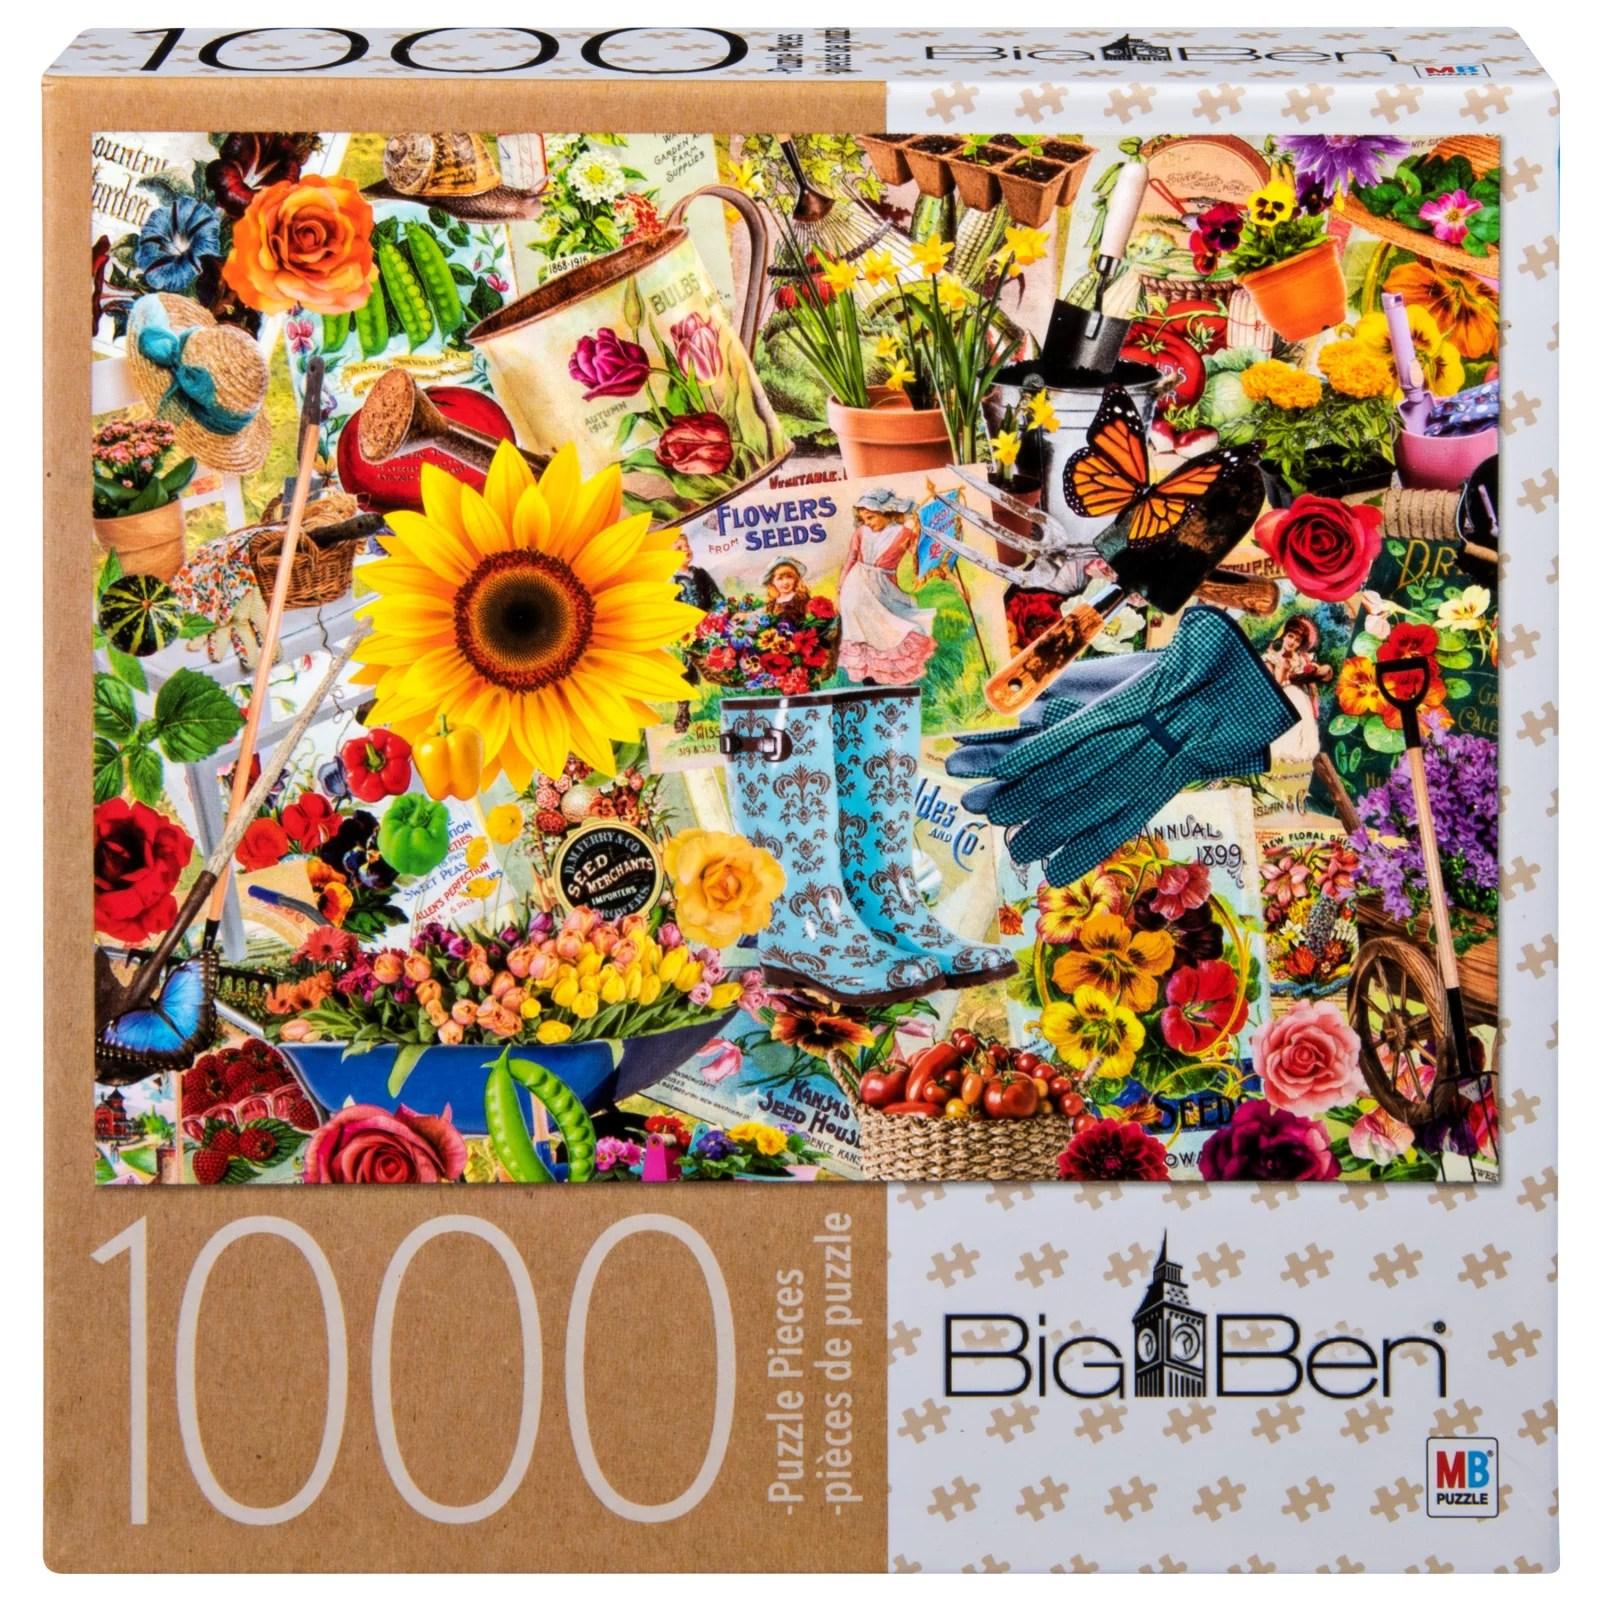 Big Ben Piece Adult Jigsaw Puzzle